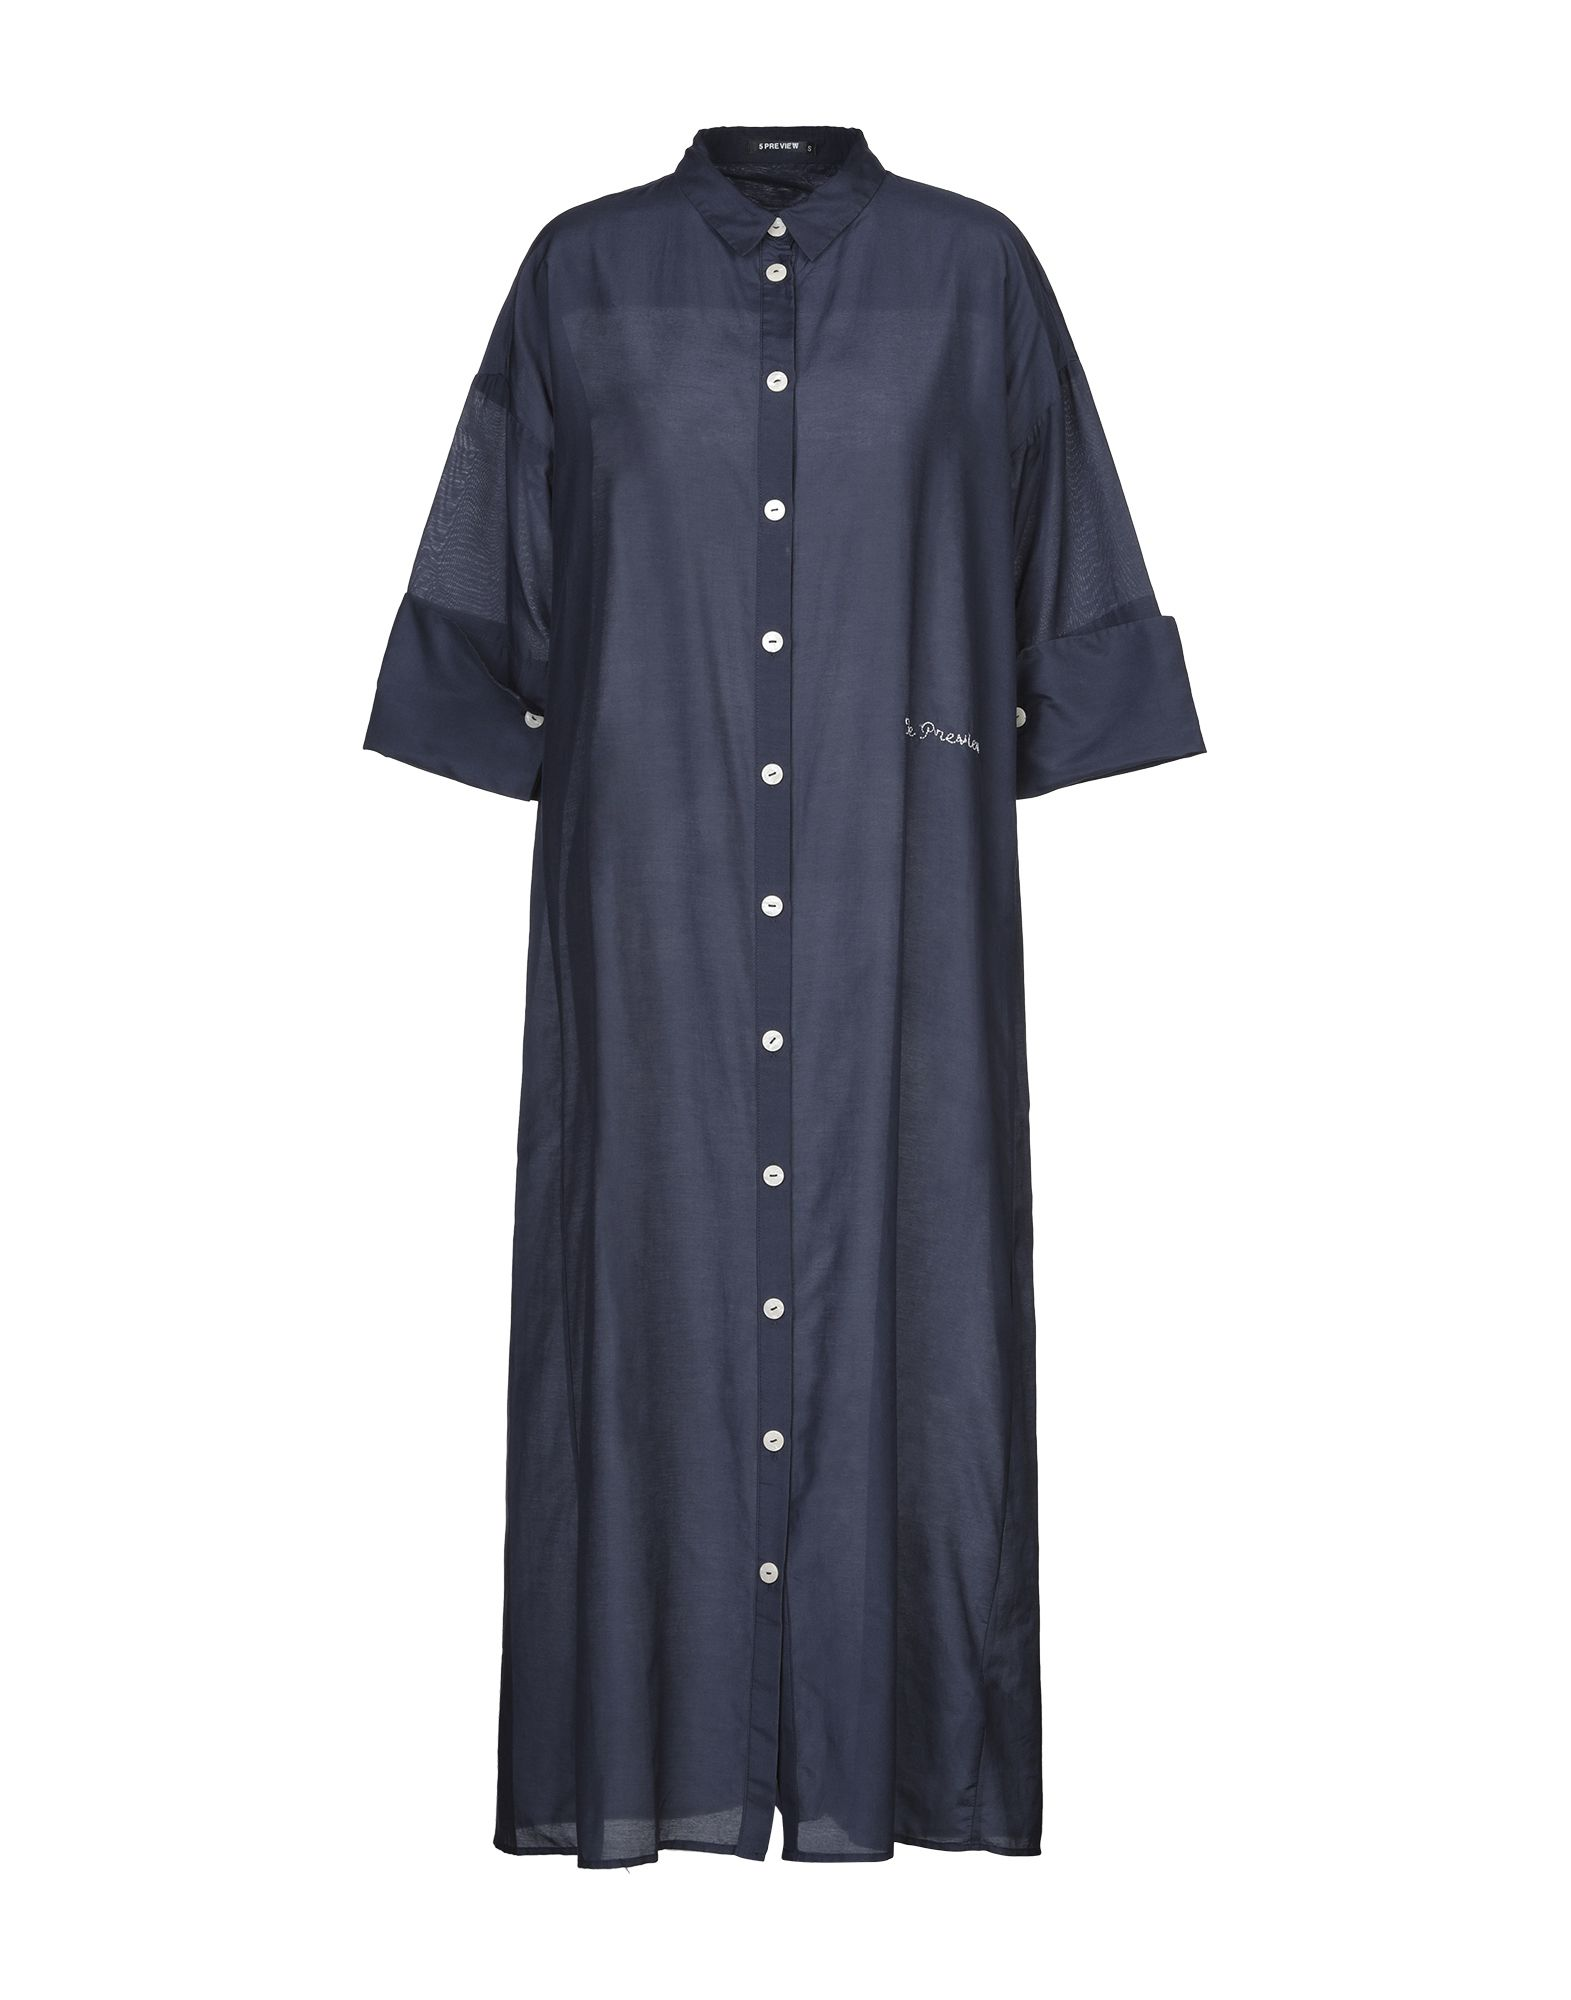 5PREVIEW Платье длиной 3/4 5preview платье длиной 3 4